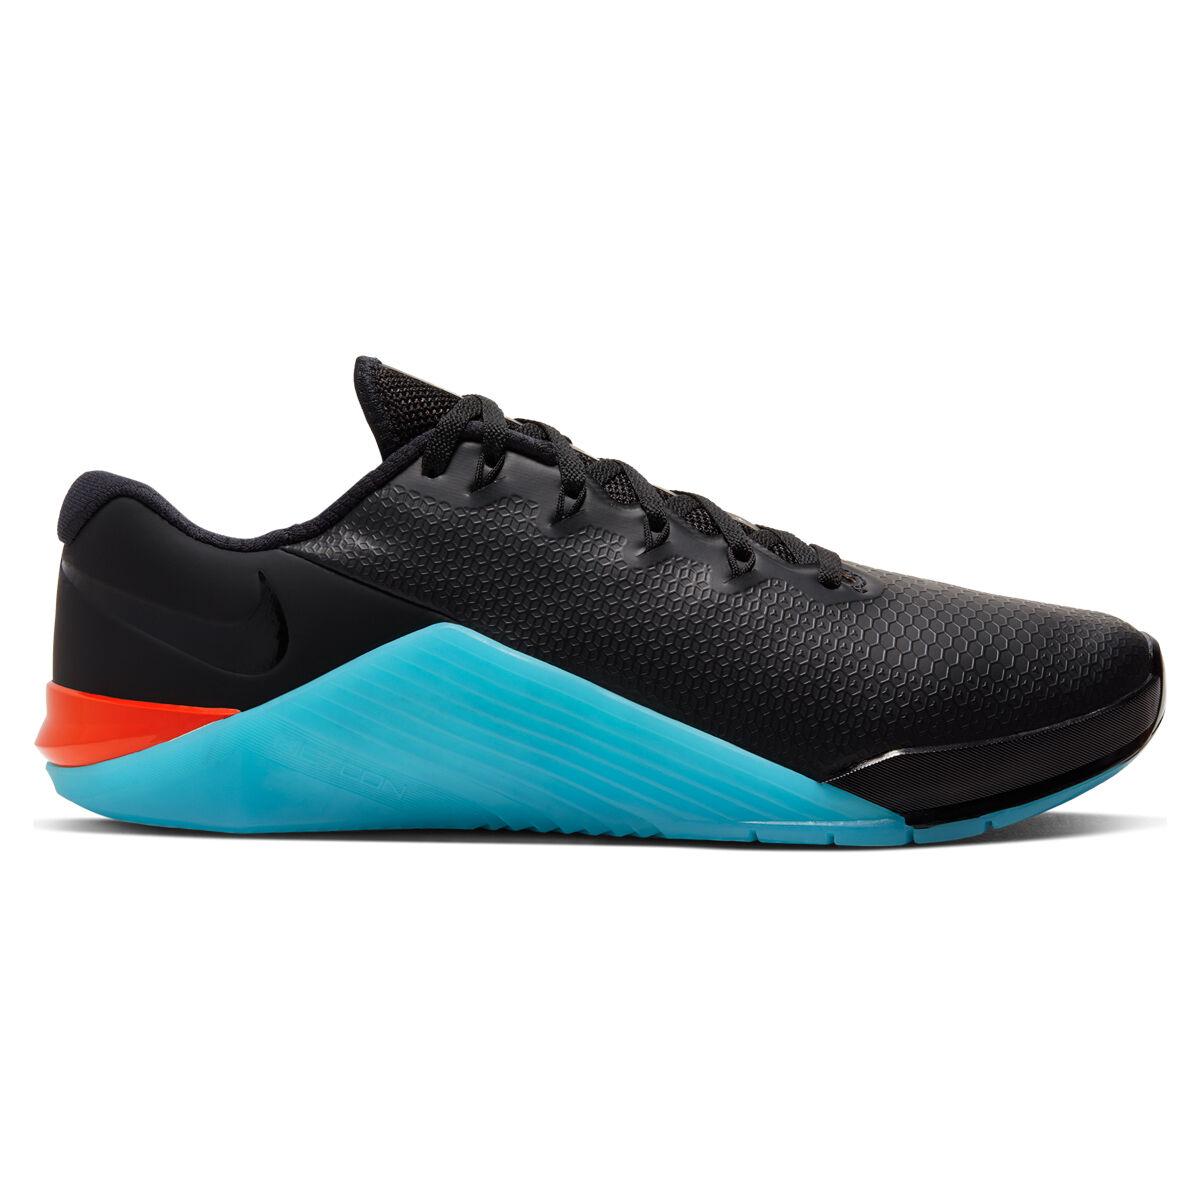 Nike Metcon 5 AMP Mens Training Shoes